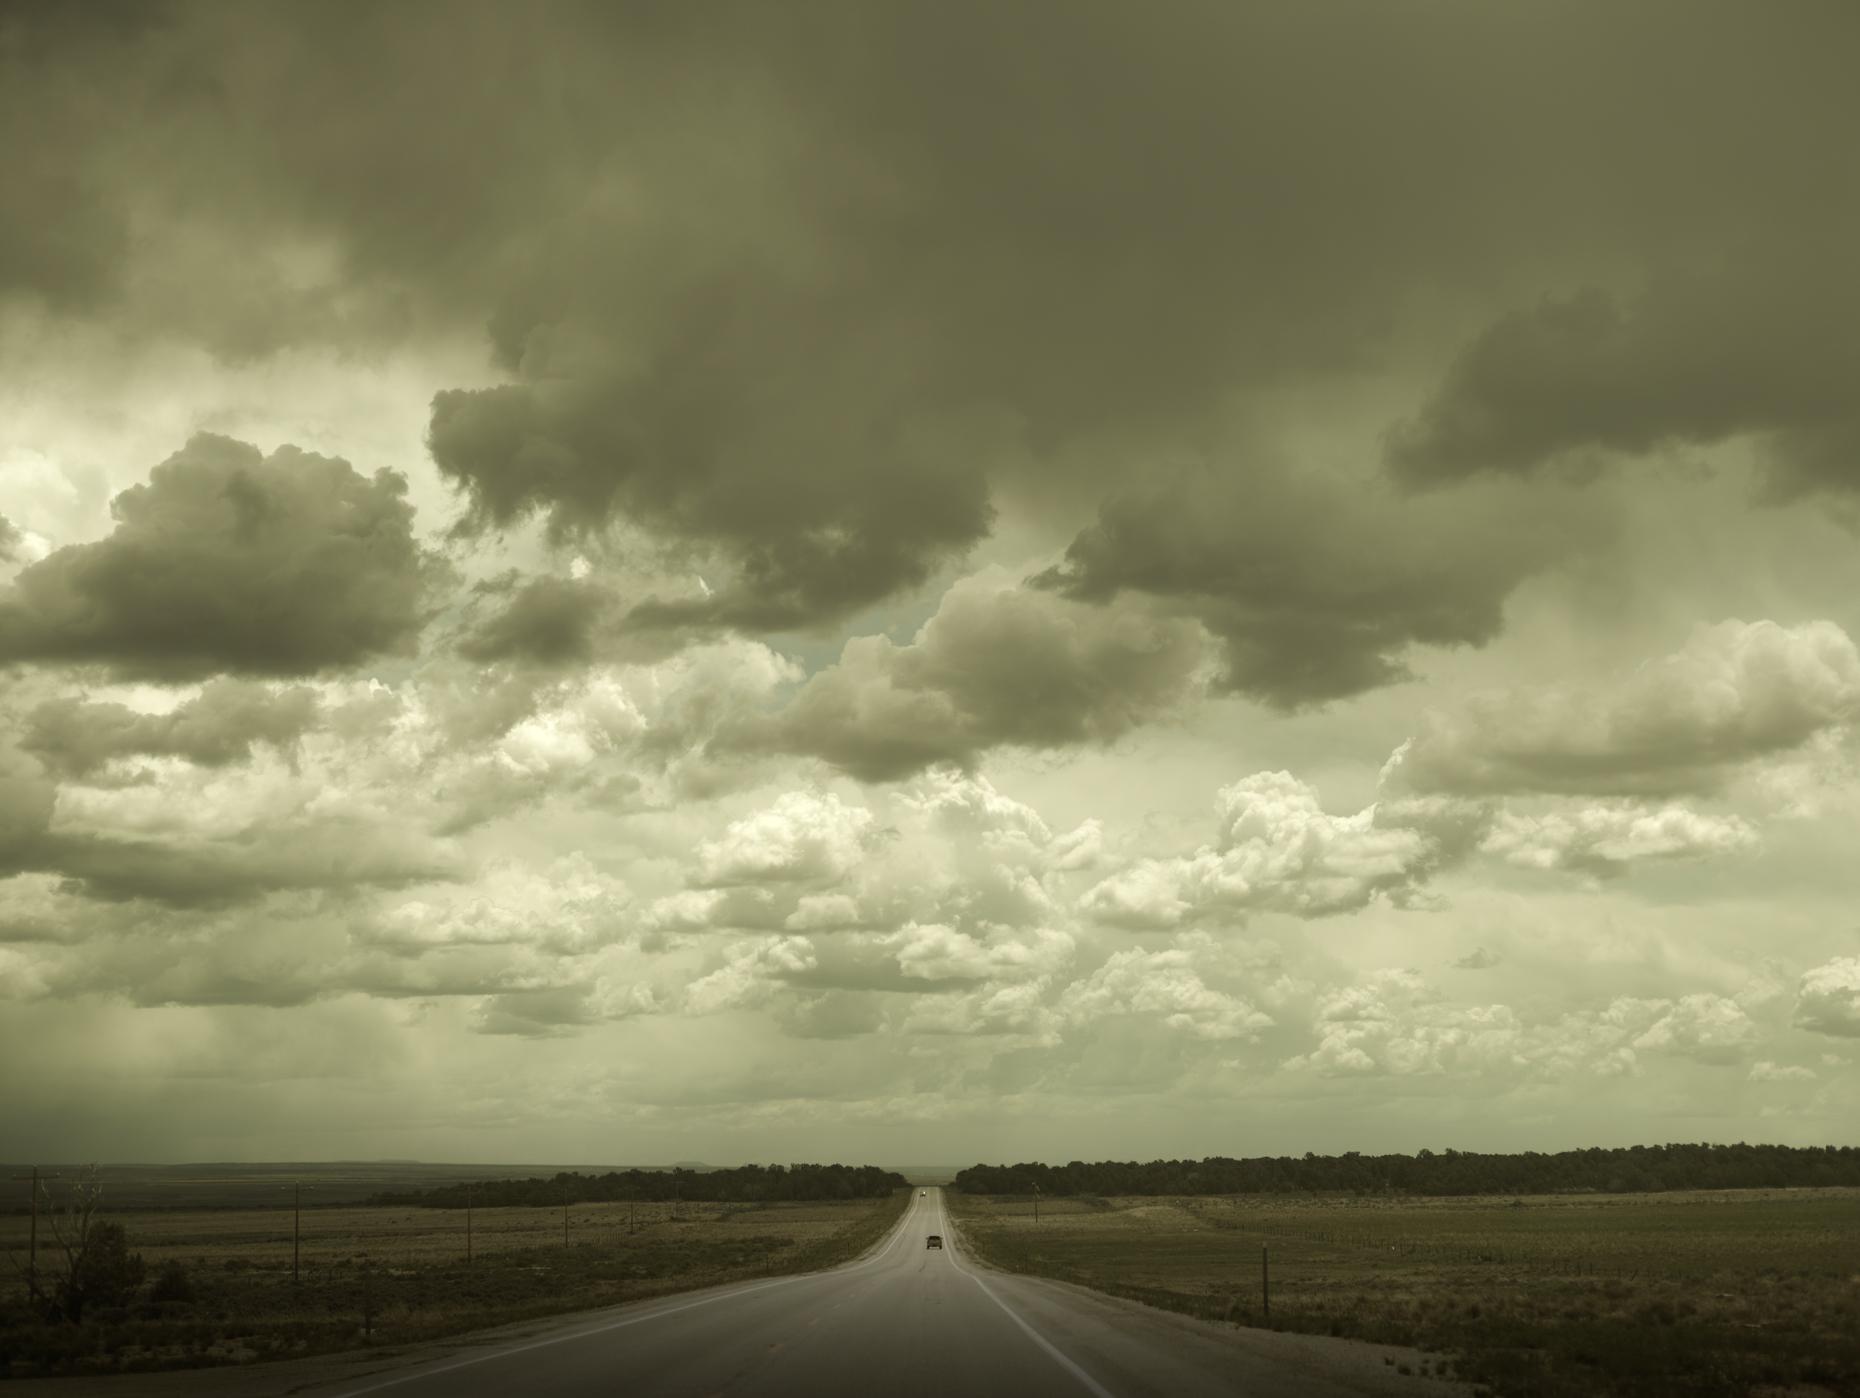 Travel Photography Derek Israelsen 023 Road Trip